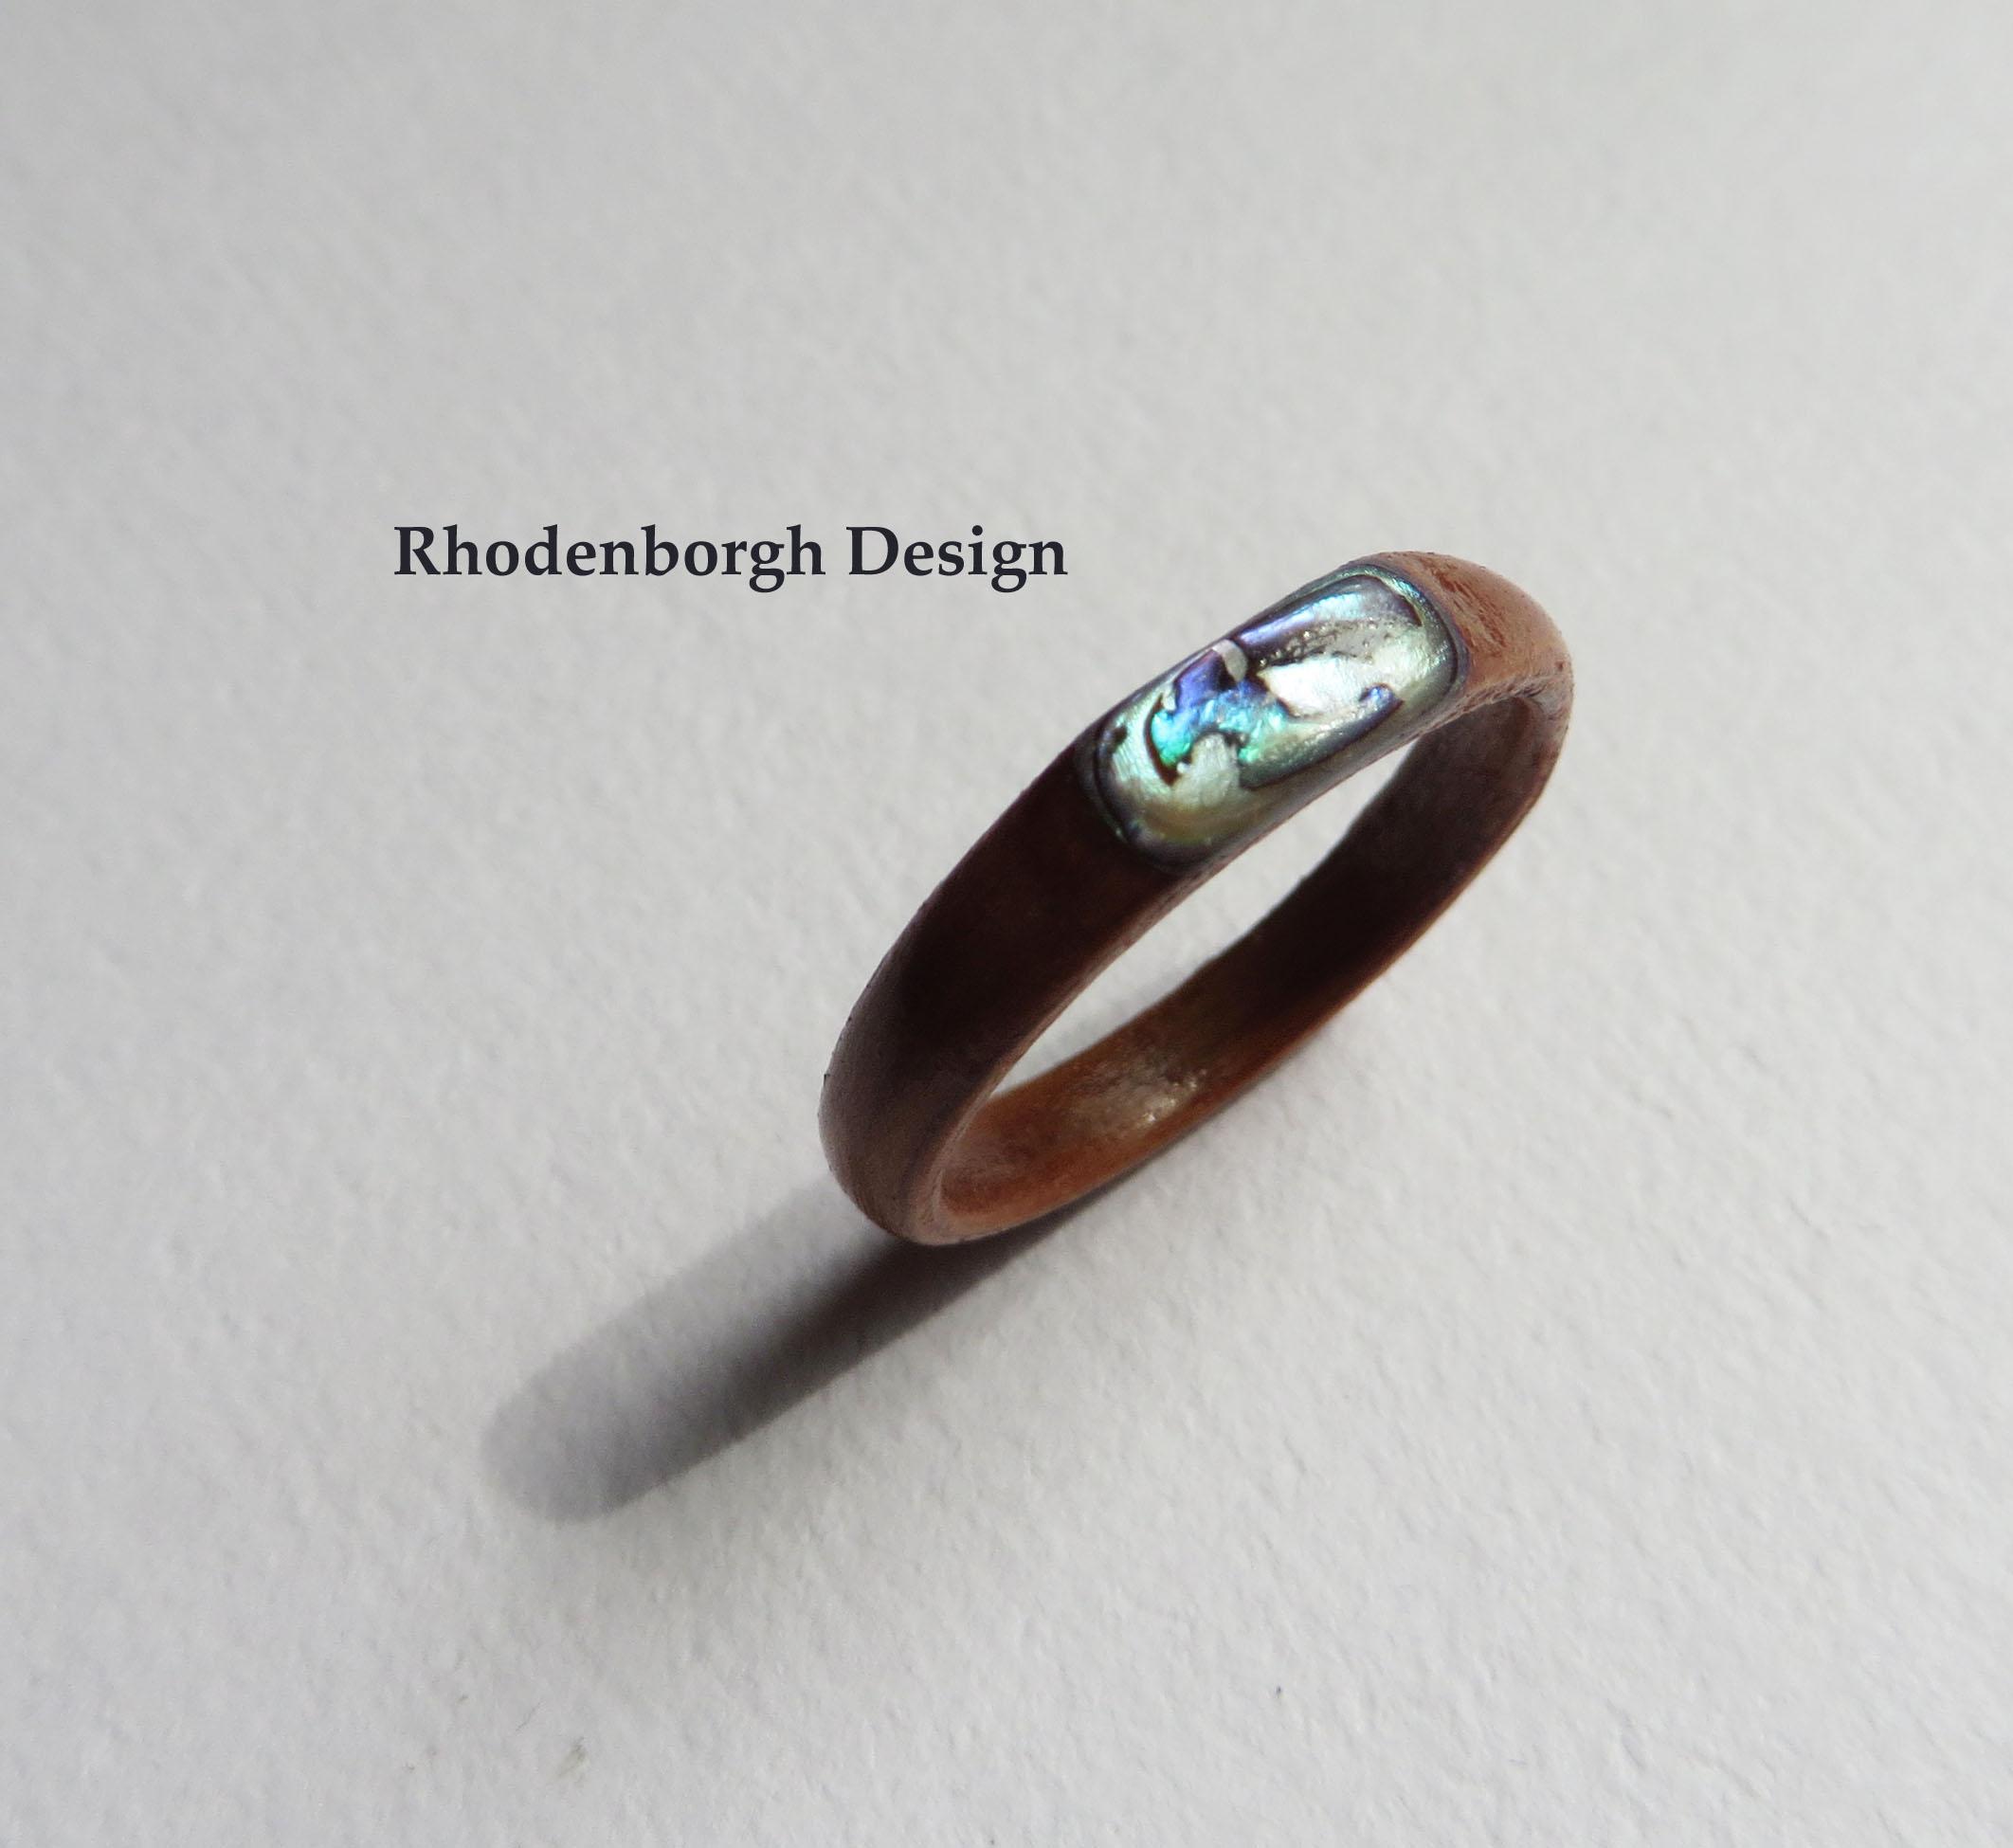 Rhodenborgh design